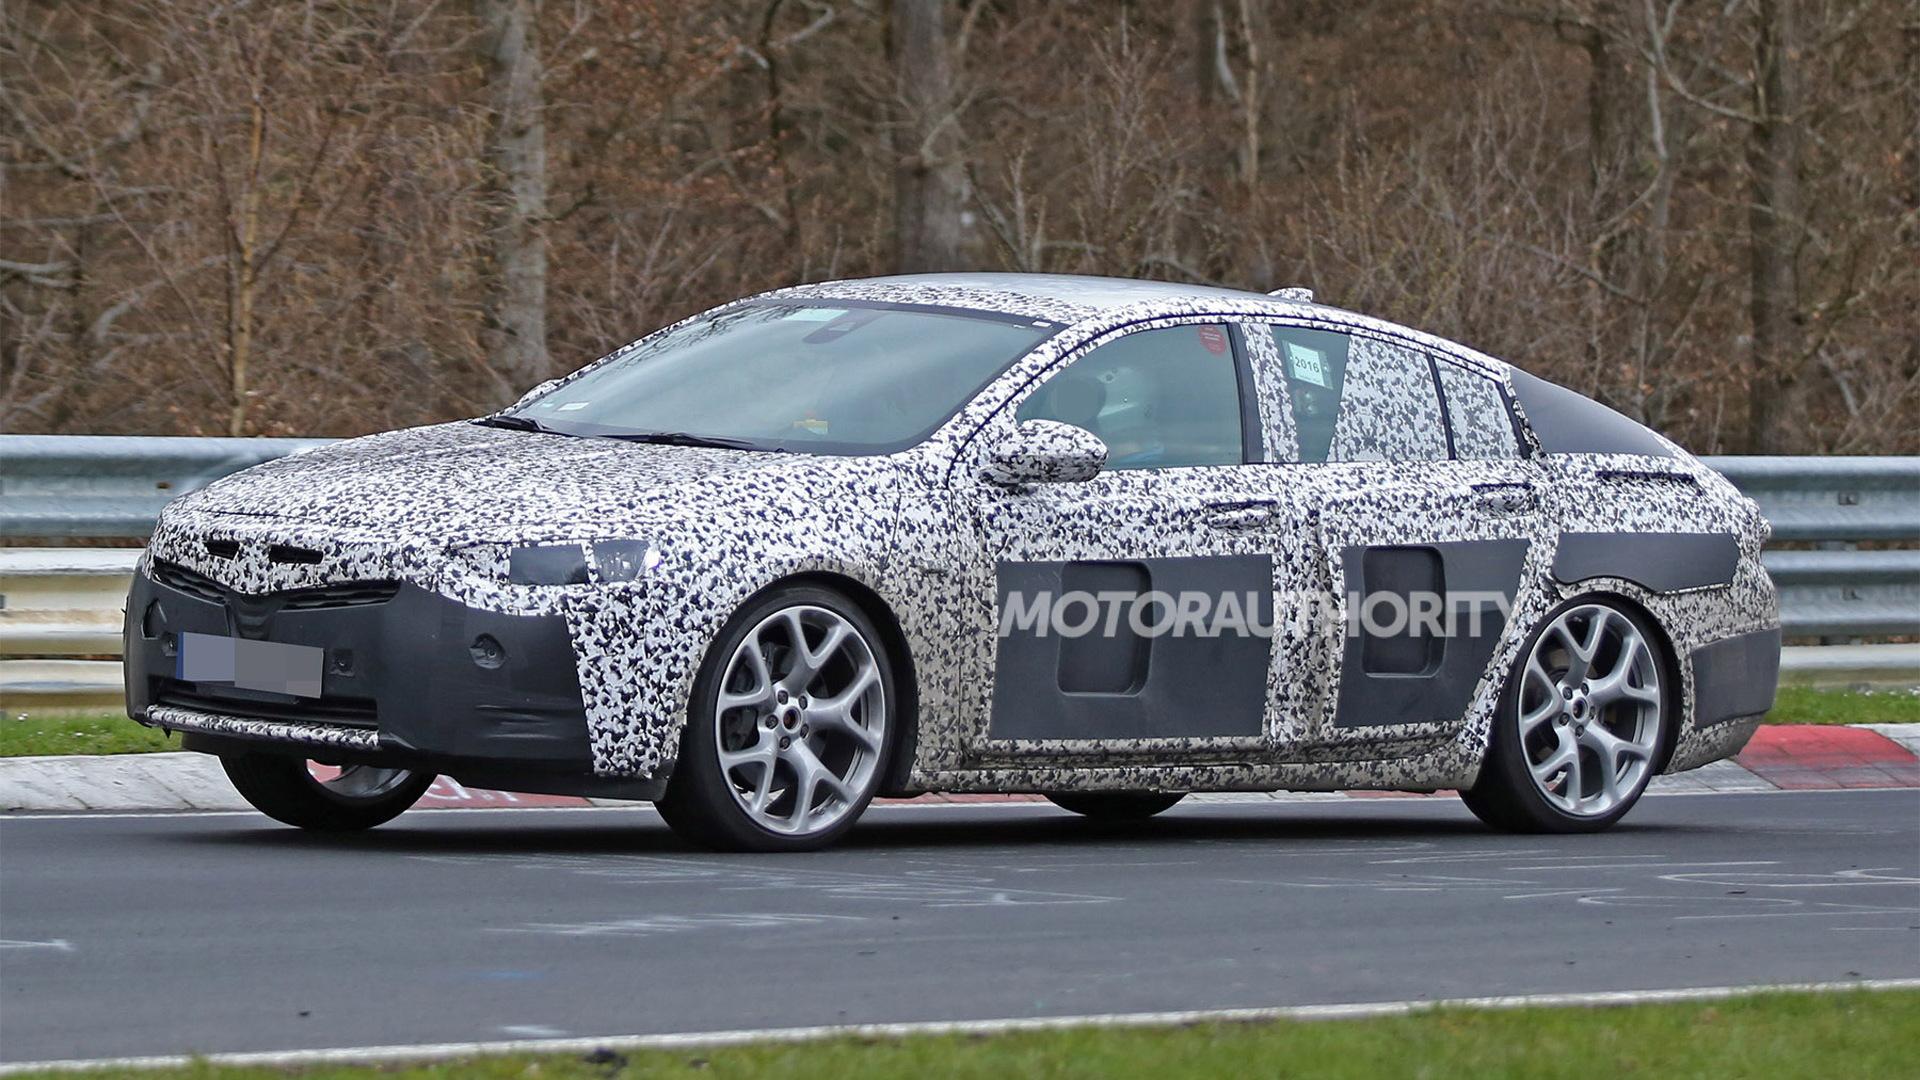 2017 Opel Insignia OPC spy shots - Image via S. Baldauf/SB-Medien